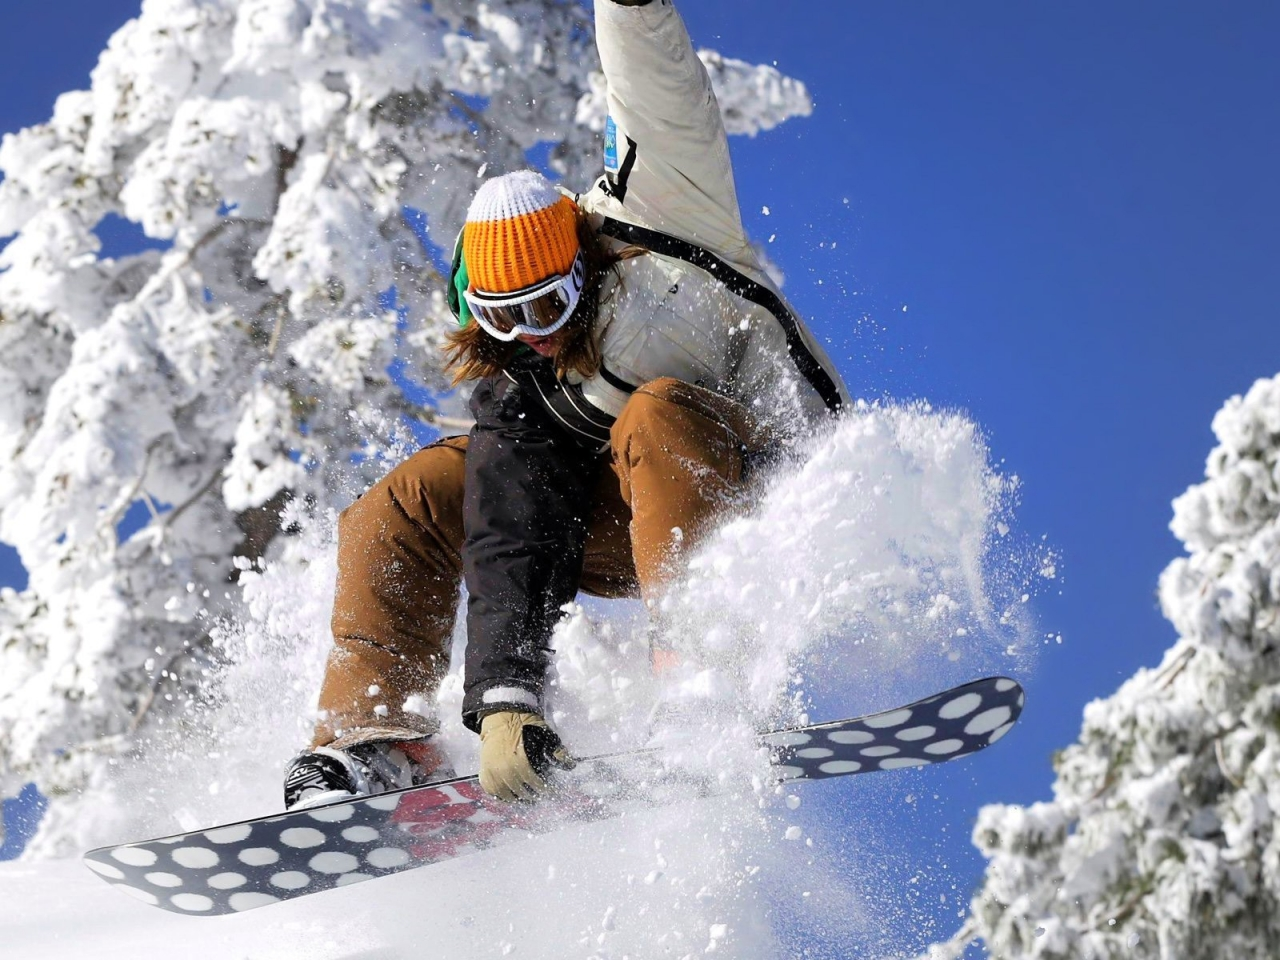 Snowboarding - 1280x960